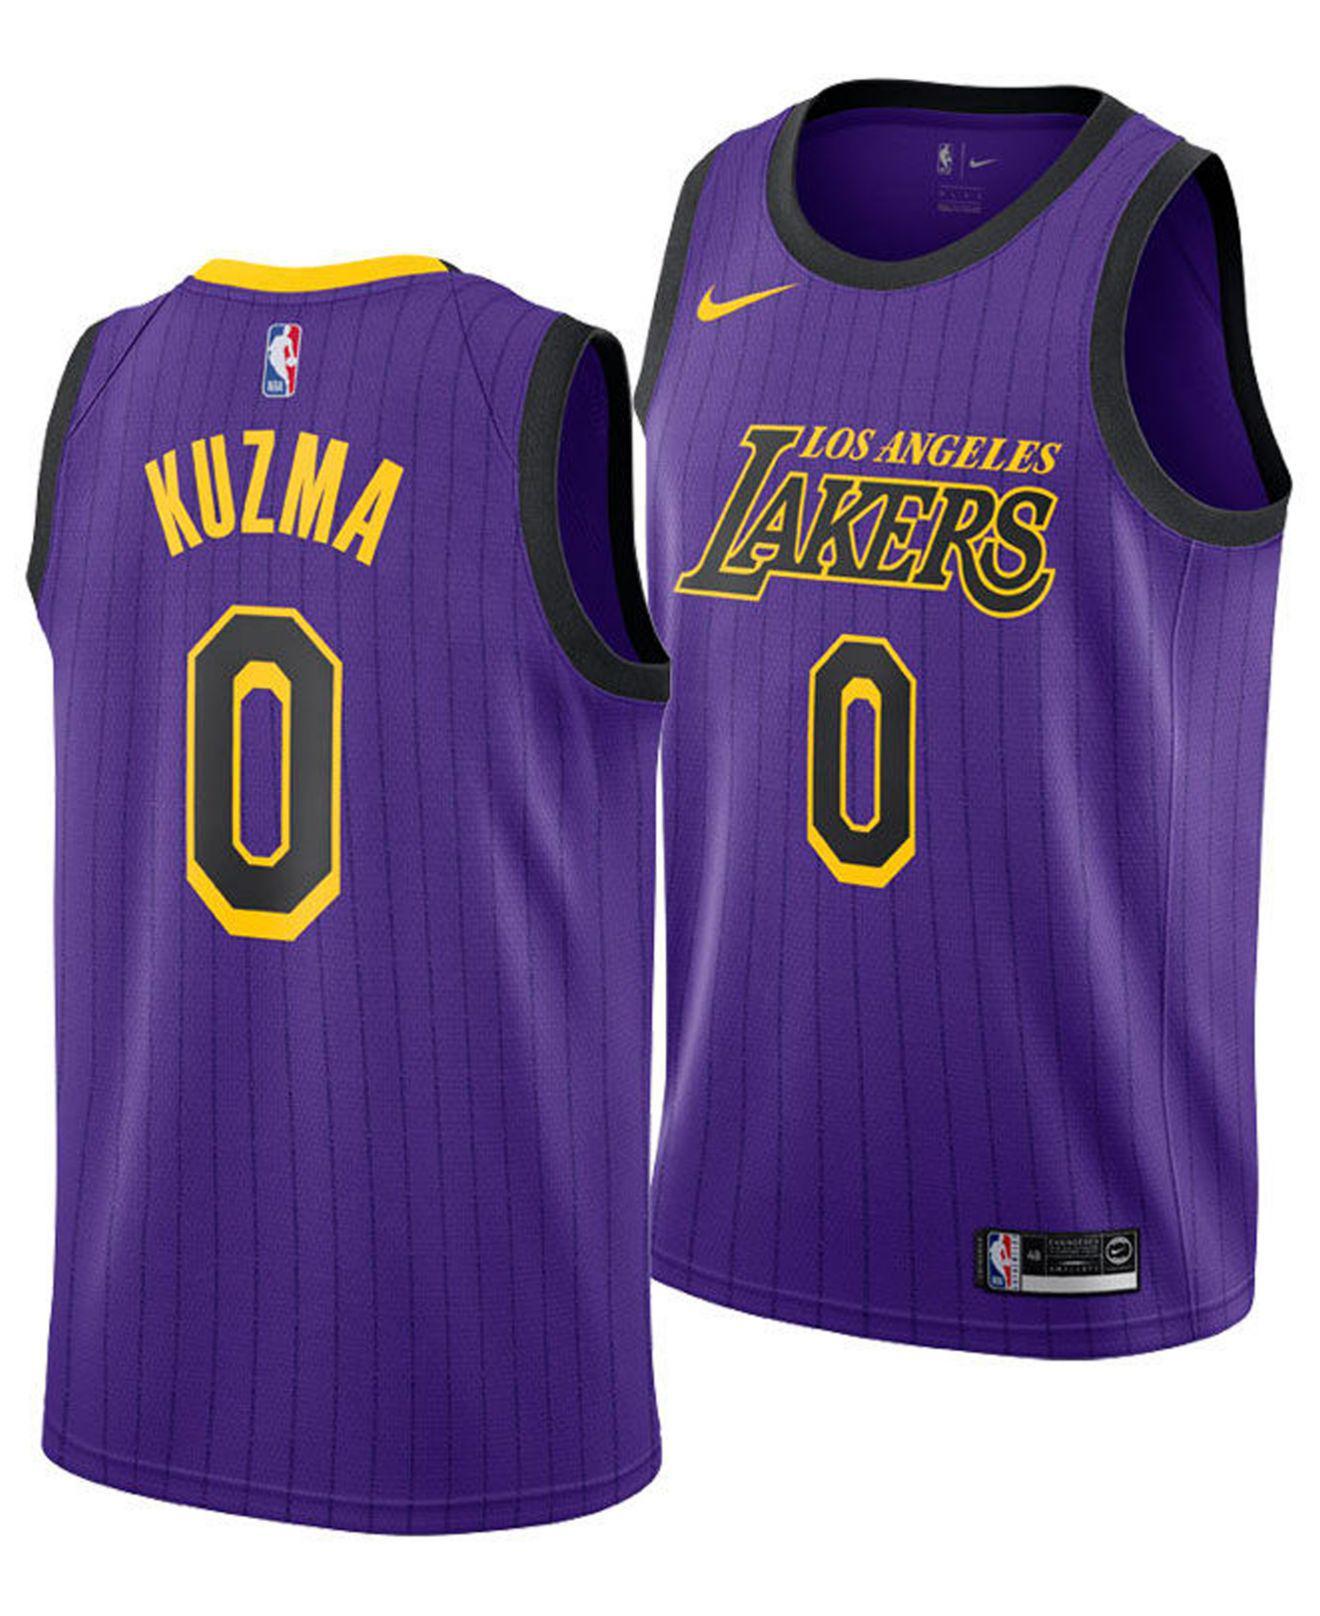 00e4a509fe1 Nike. Men s Purple Kyle Kuzma Los Angeles Lakers City Swingman Jersey 2018